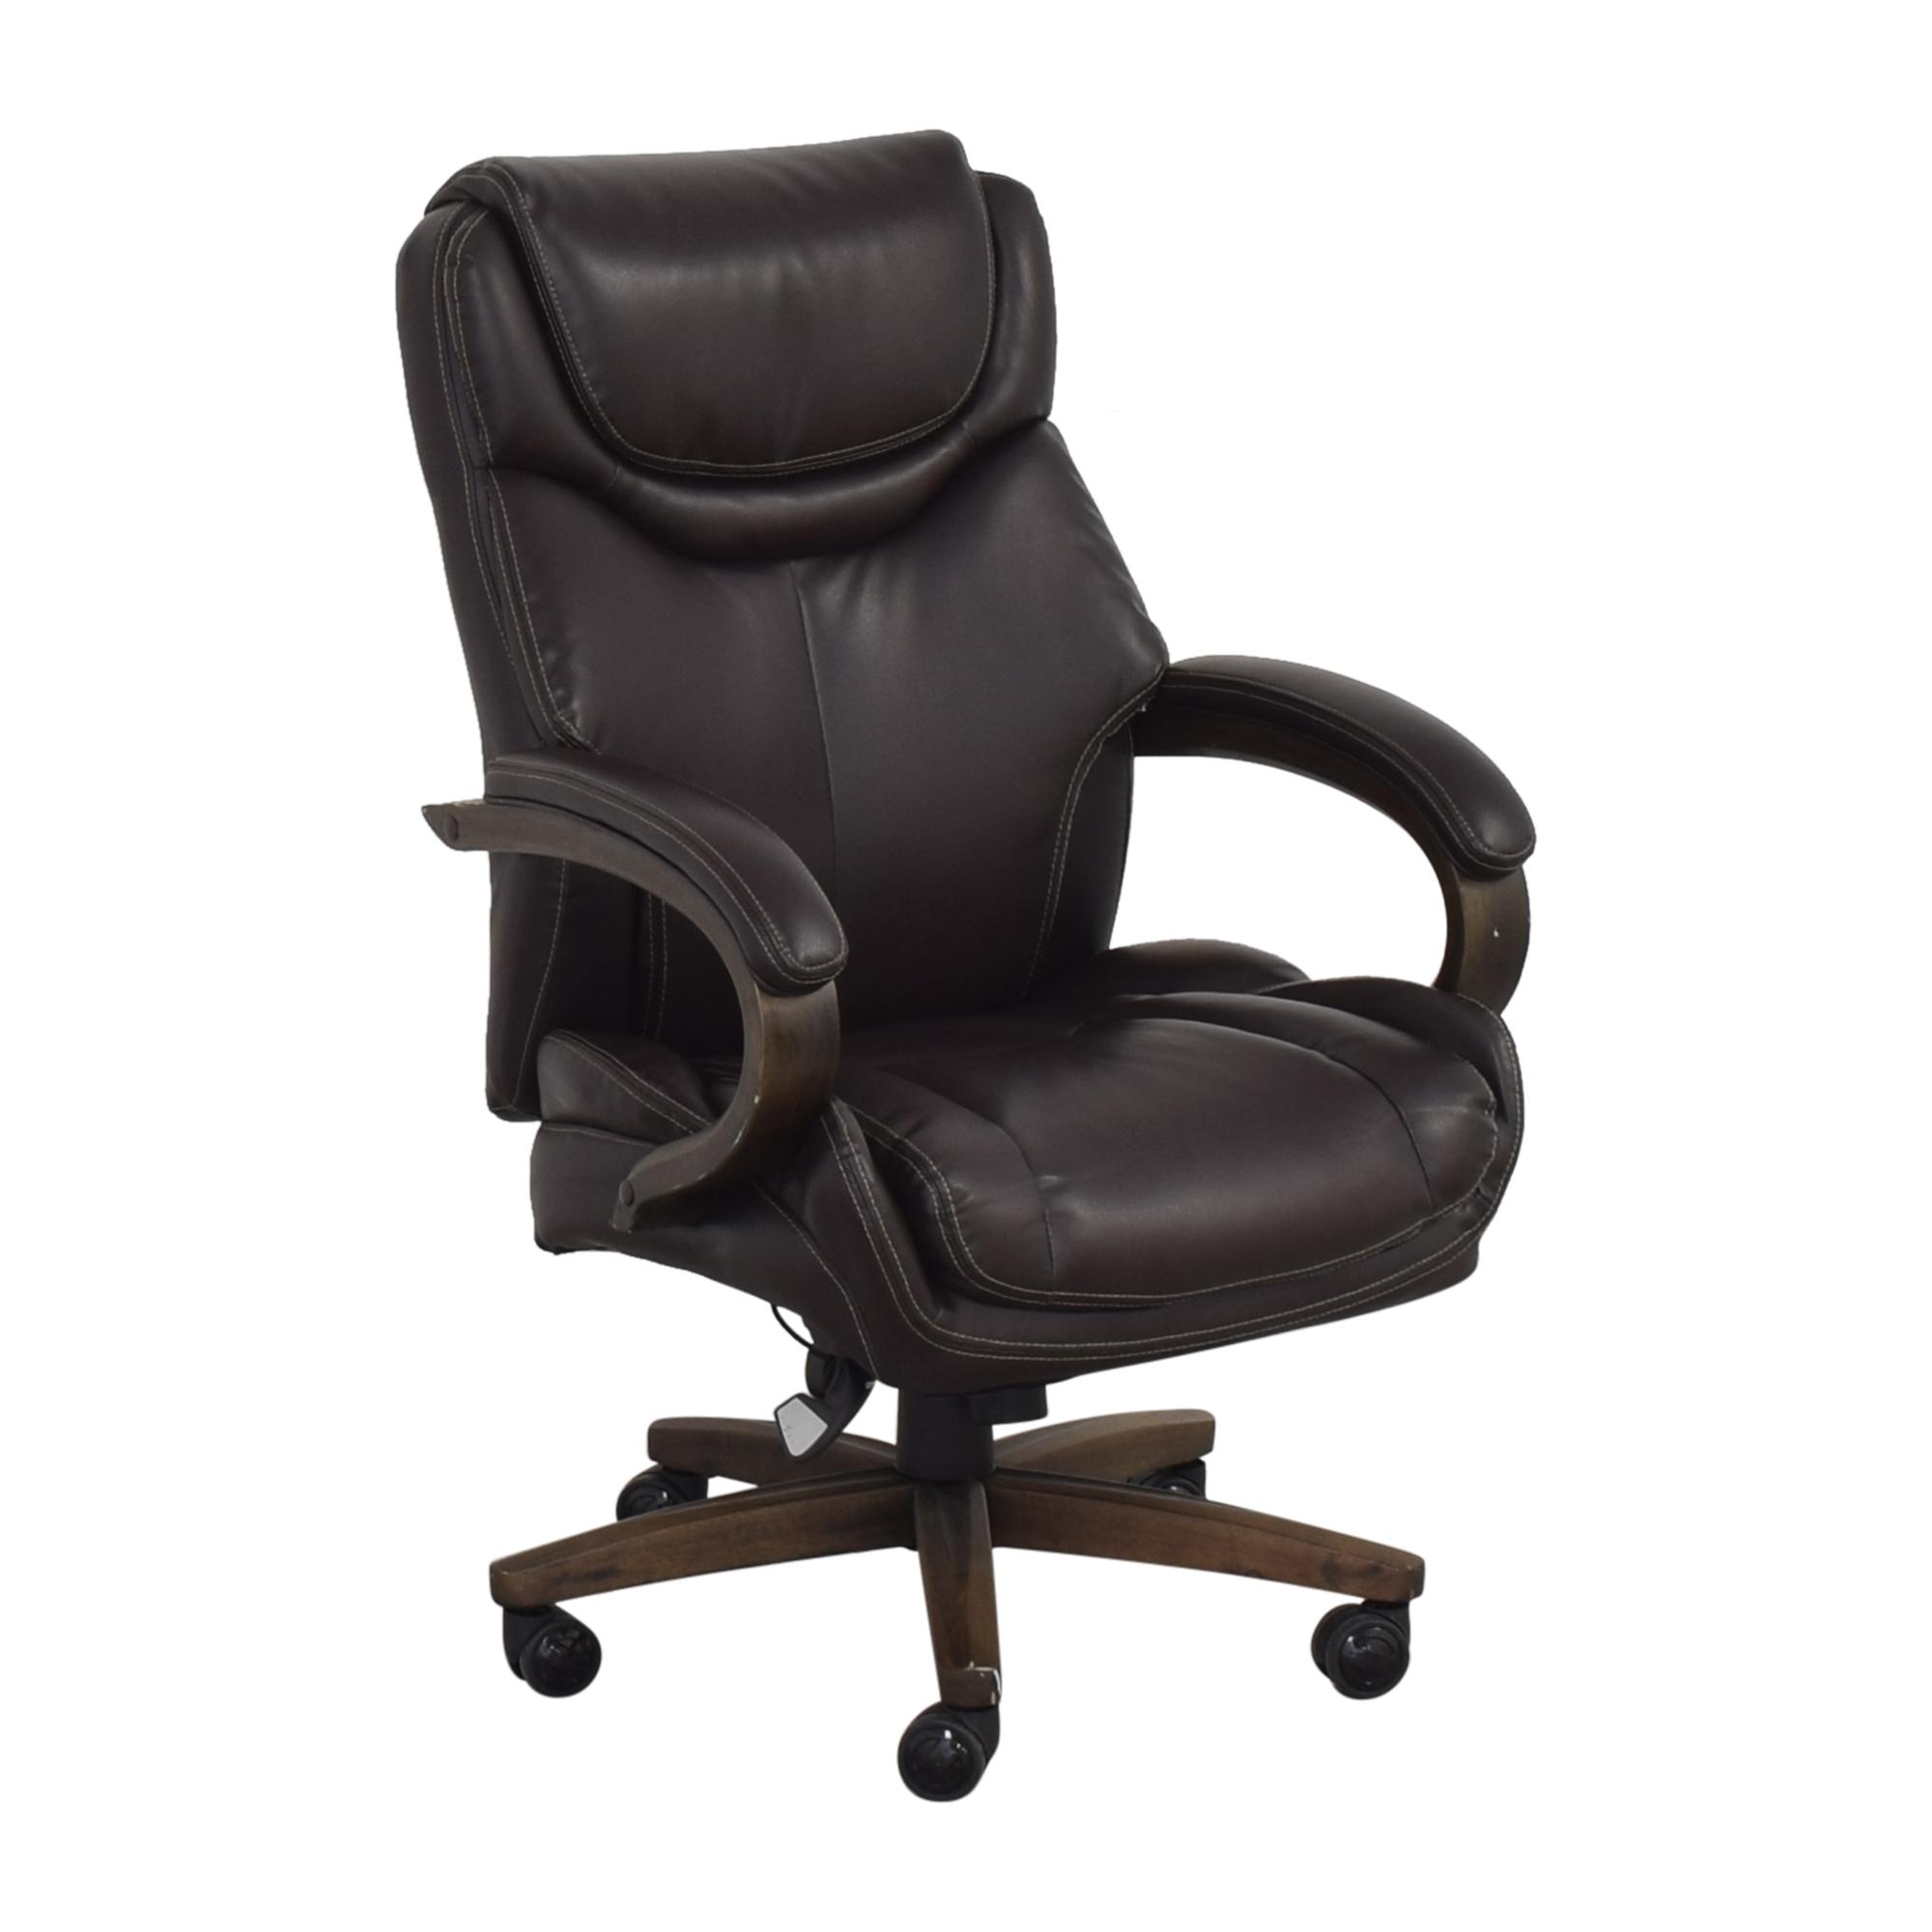 La-Z-Boy La-Z-Boy Executive-Style Office Chair used